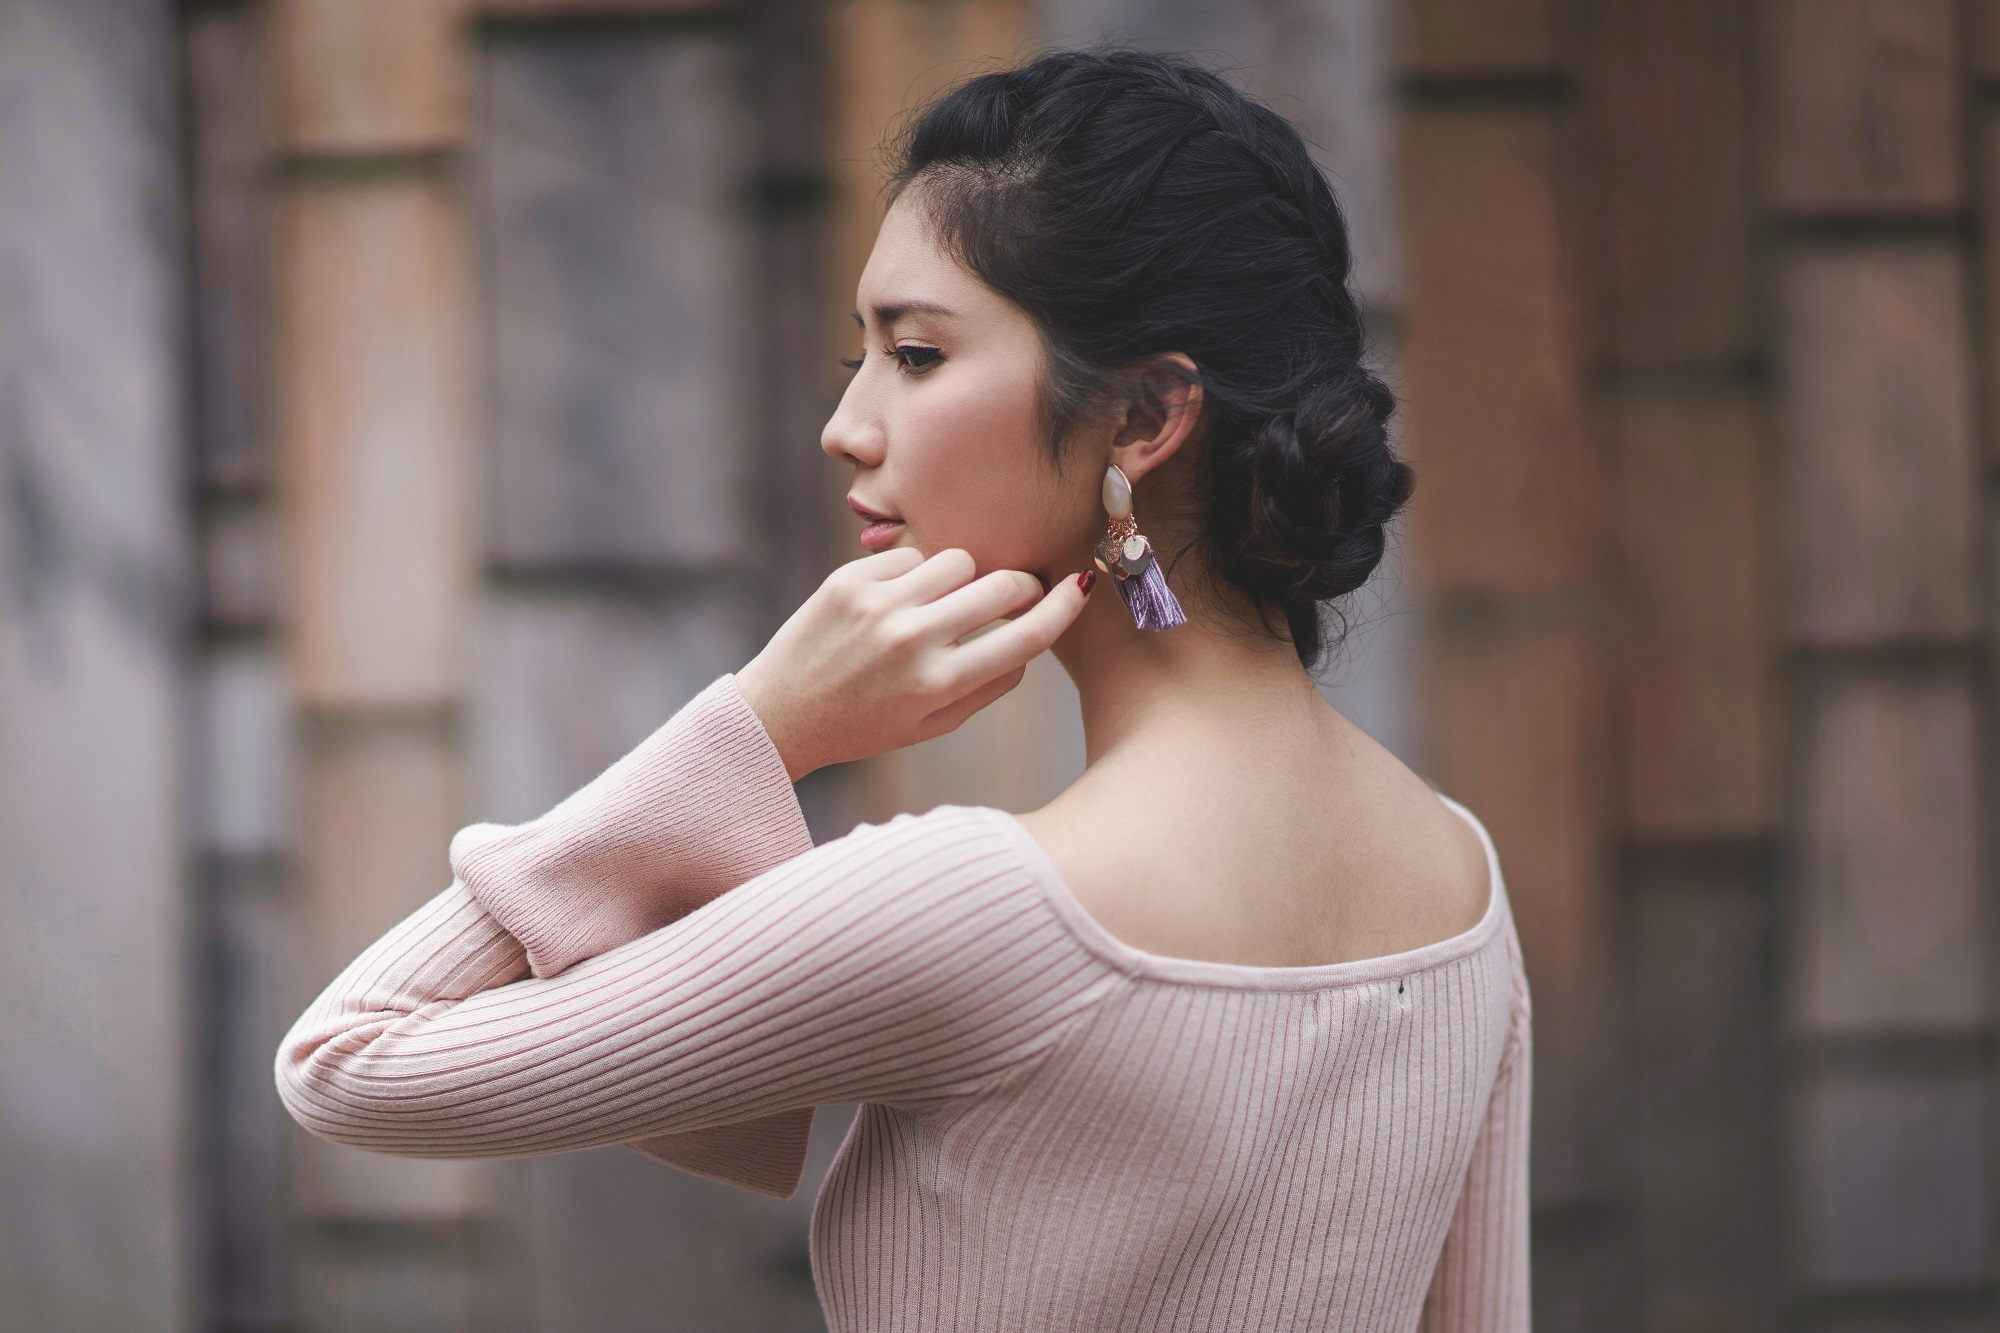 Wedding hair braids: Asian woman with side braid bun